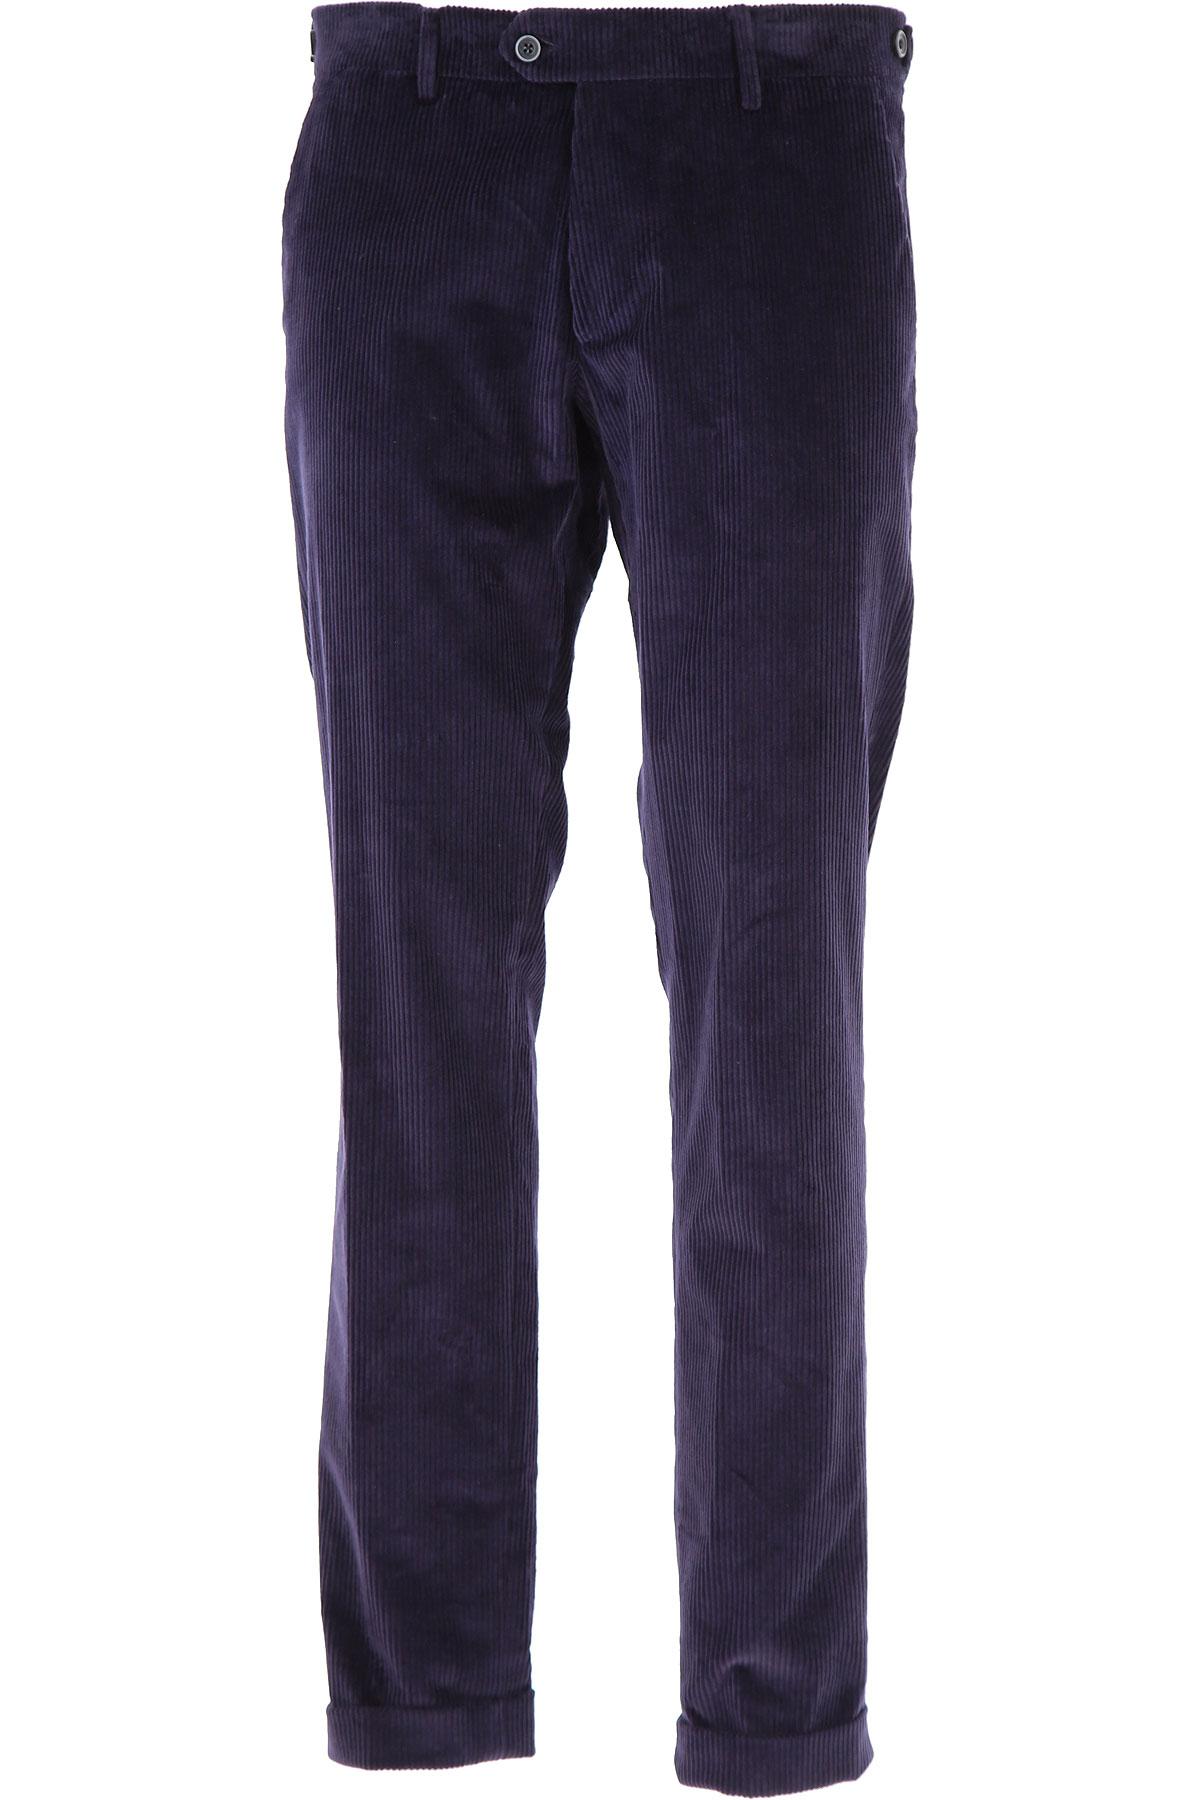 Image of Berwich Pants for Men, navy, Cotton, 2017, 30 34 36 38